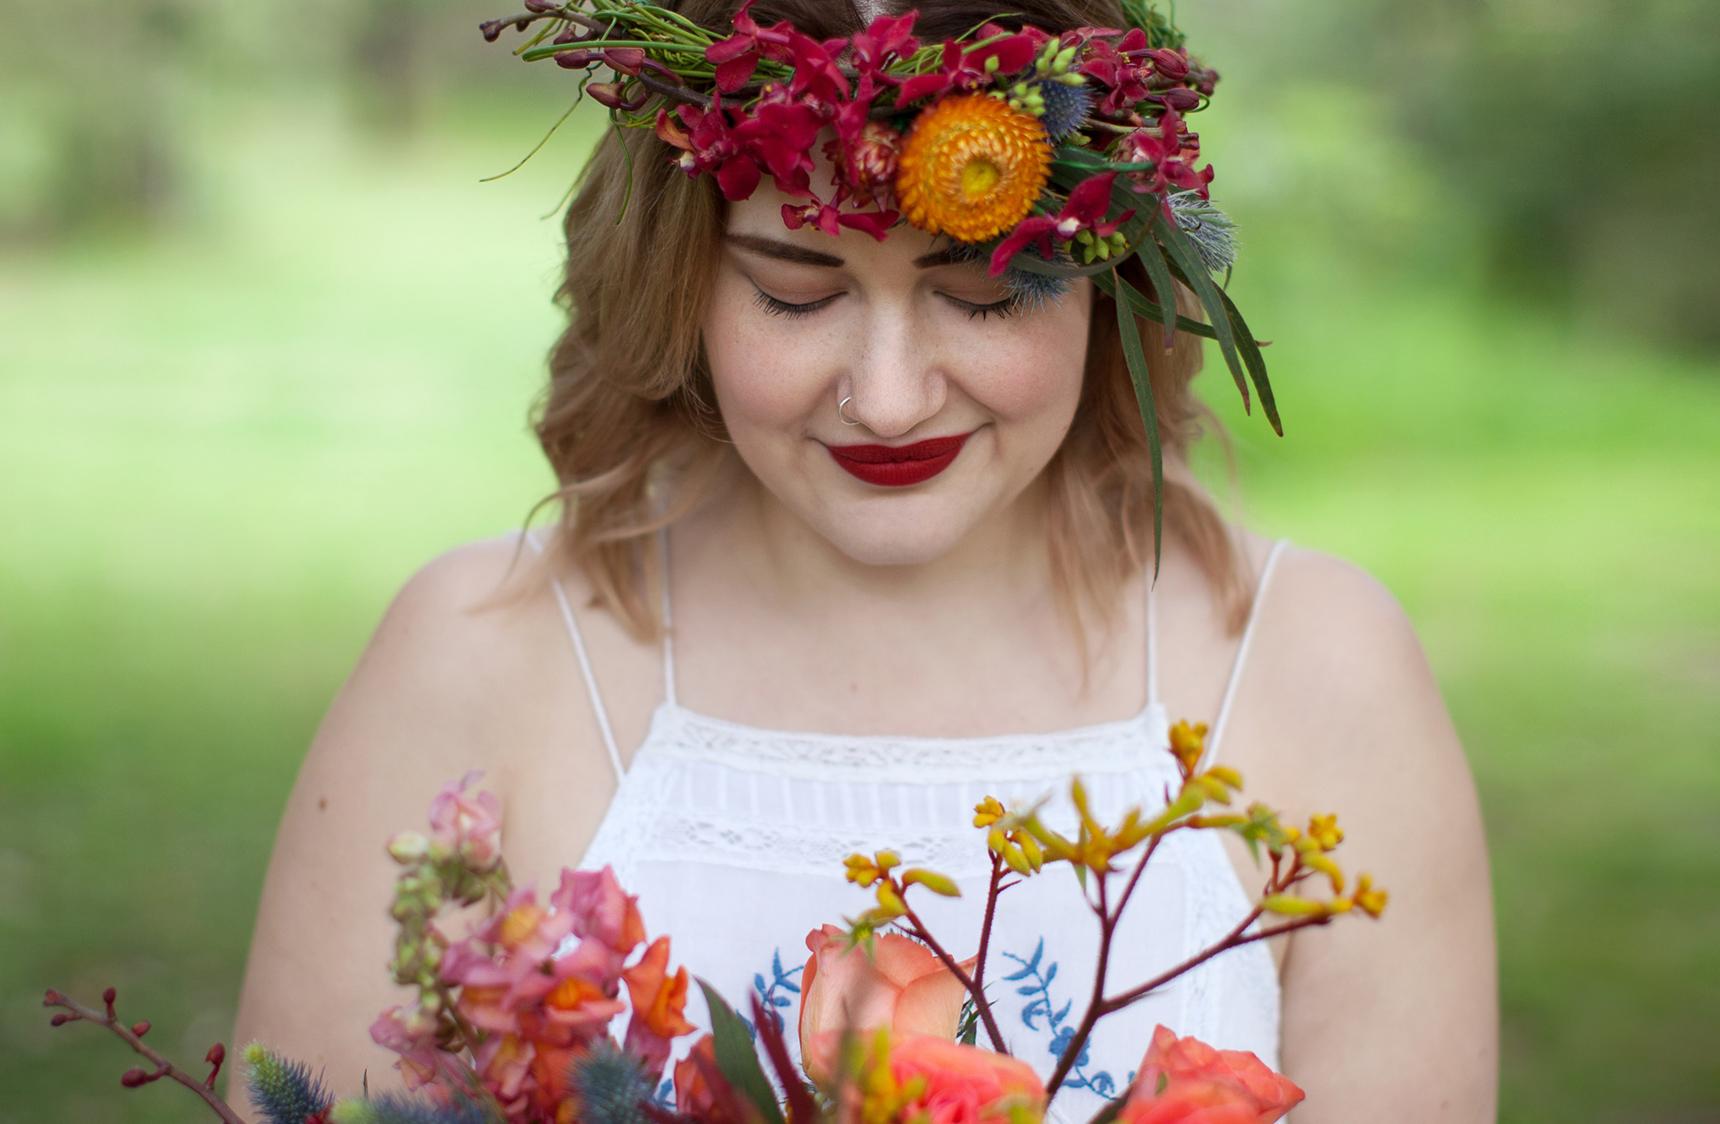 mjk_autumn-kisses-floral_01